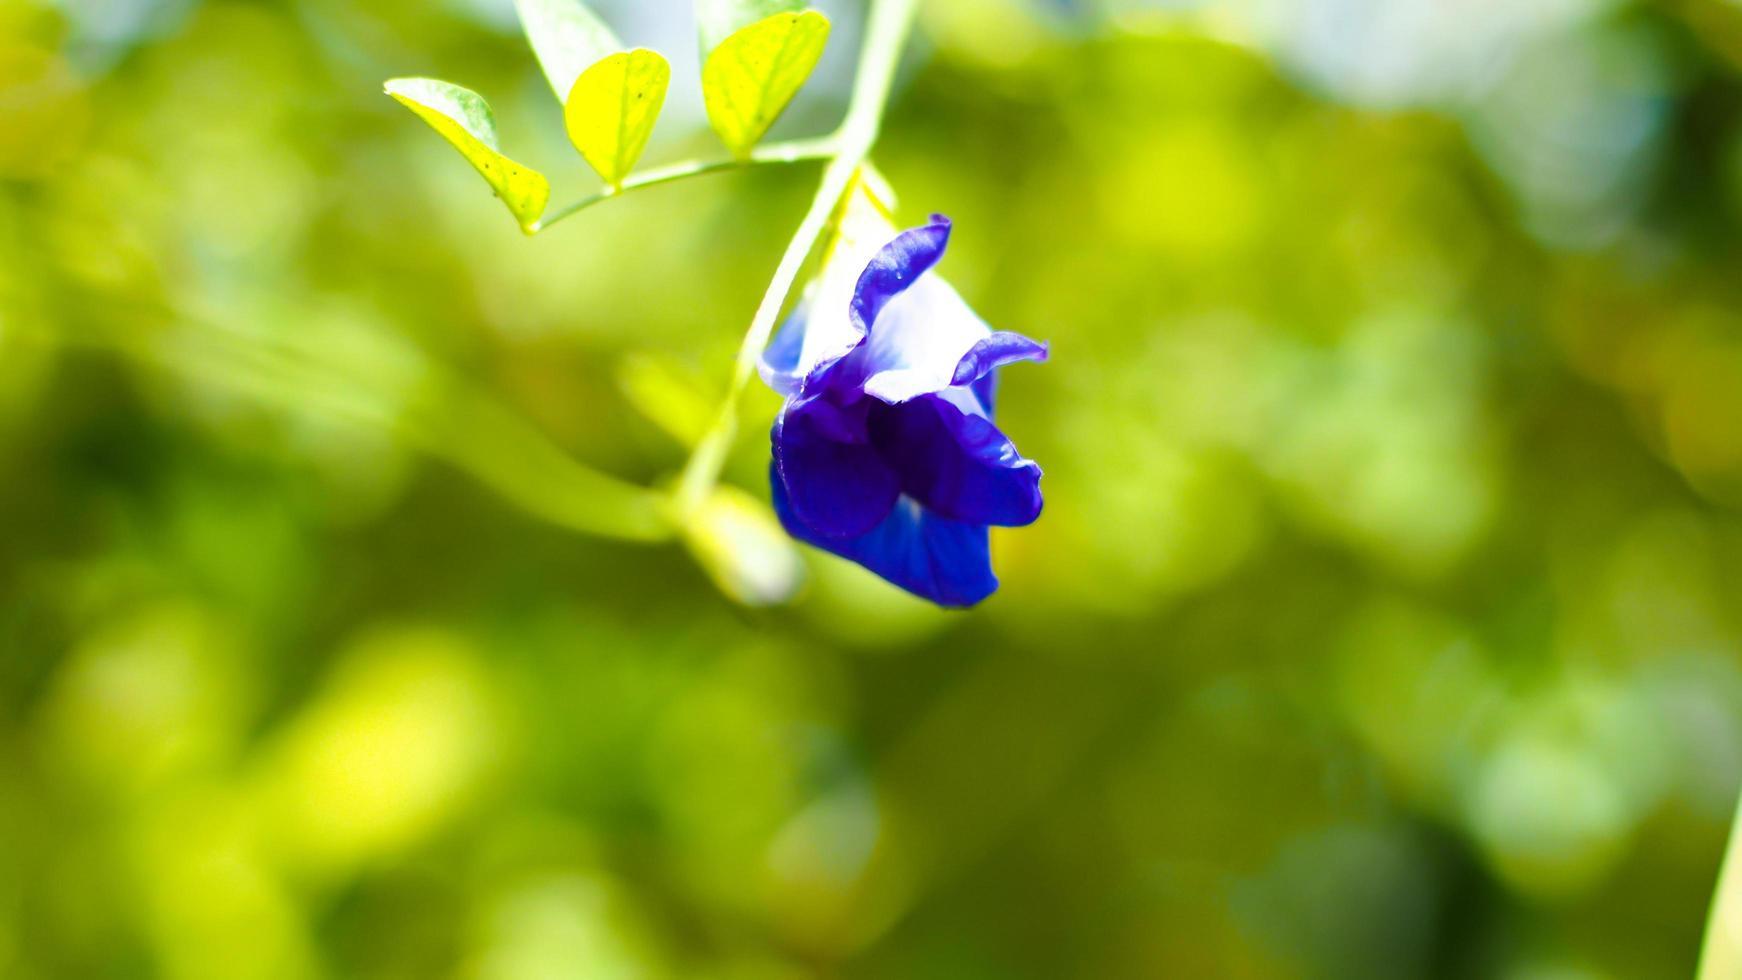 ala de paloma bluebellvine flor de guisante azul foto